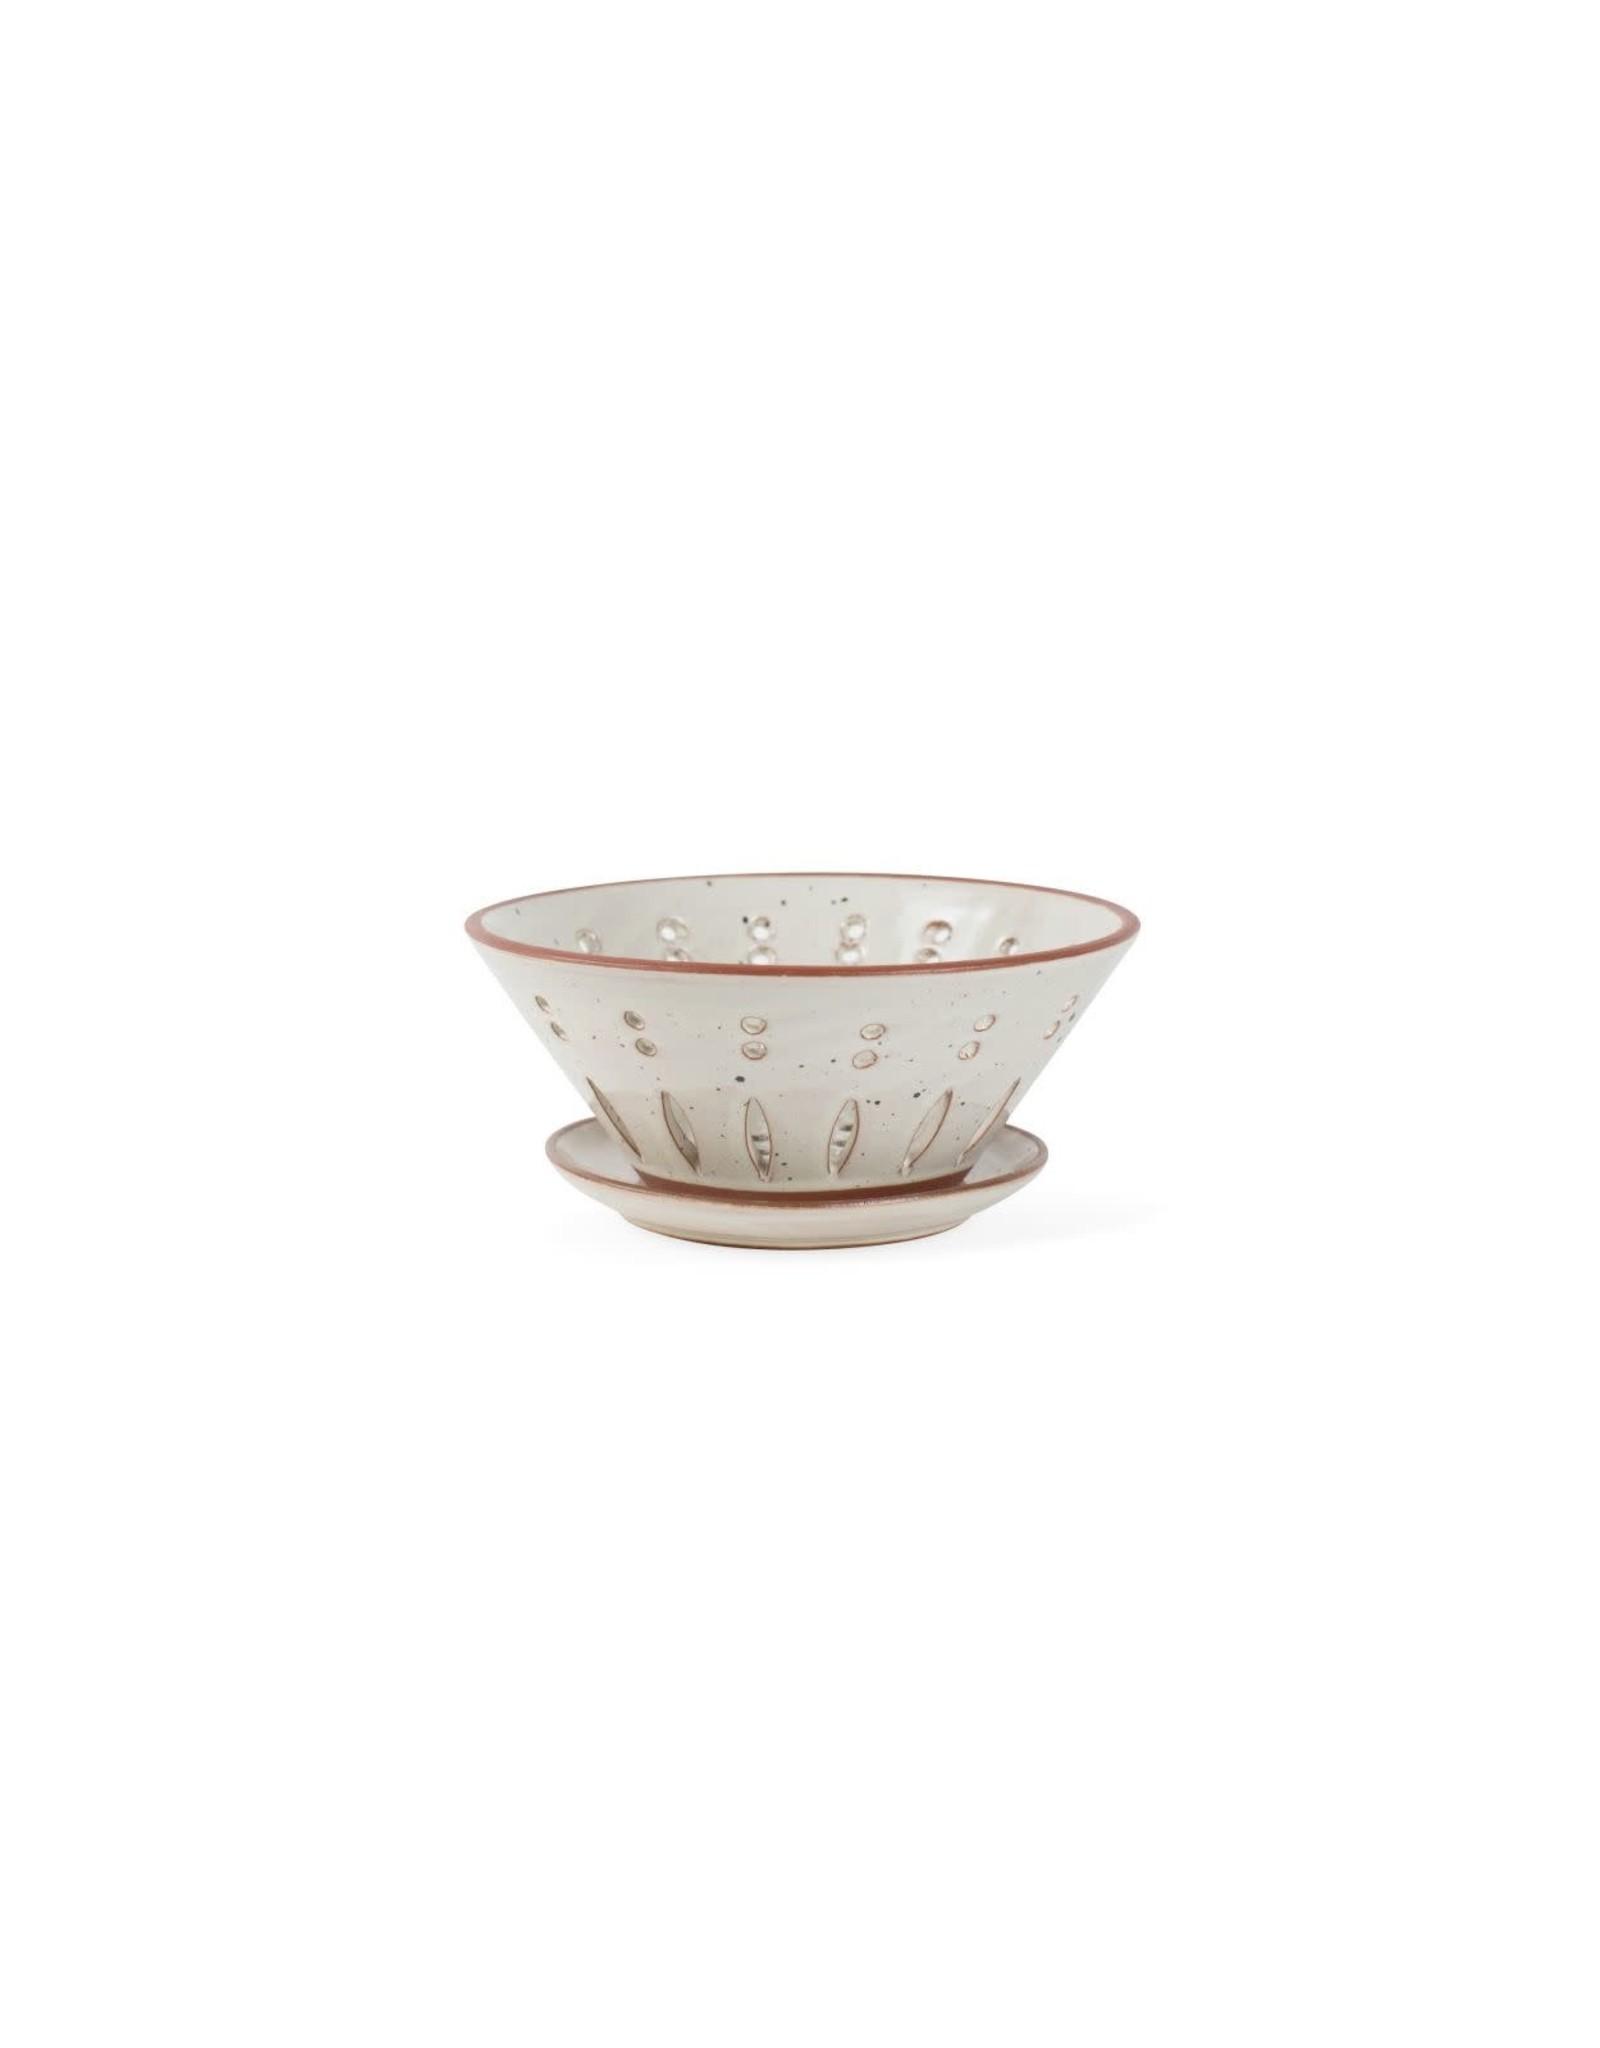 Speckled Ceramic Colander, Nepal